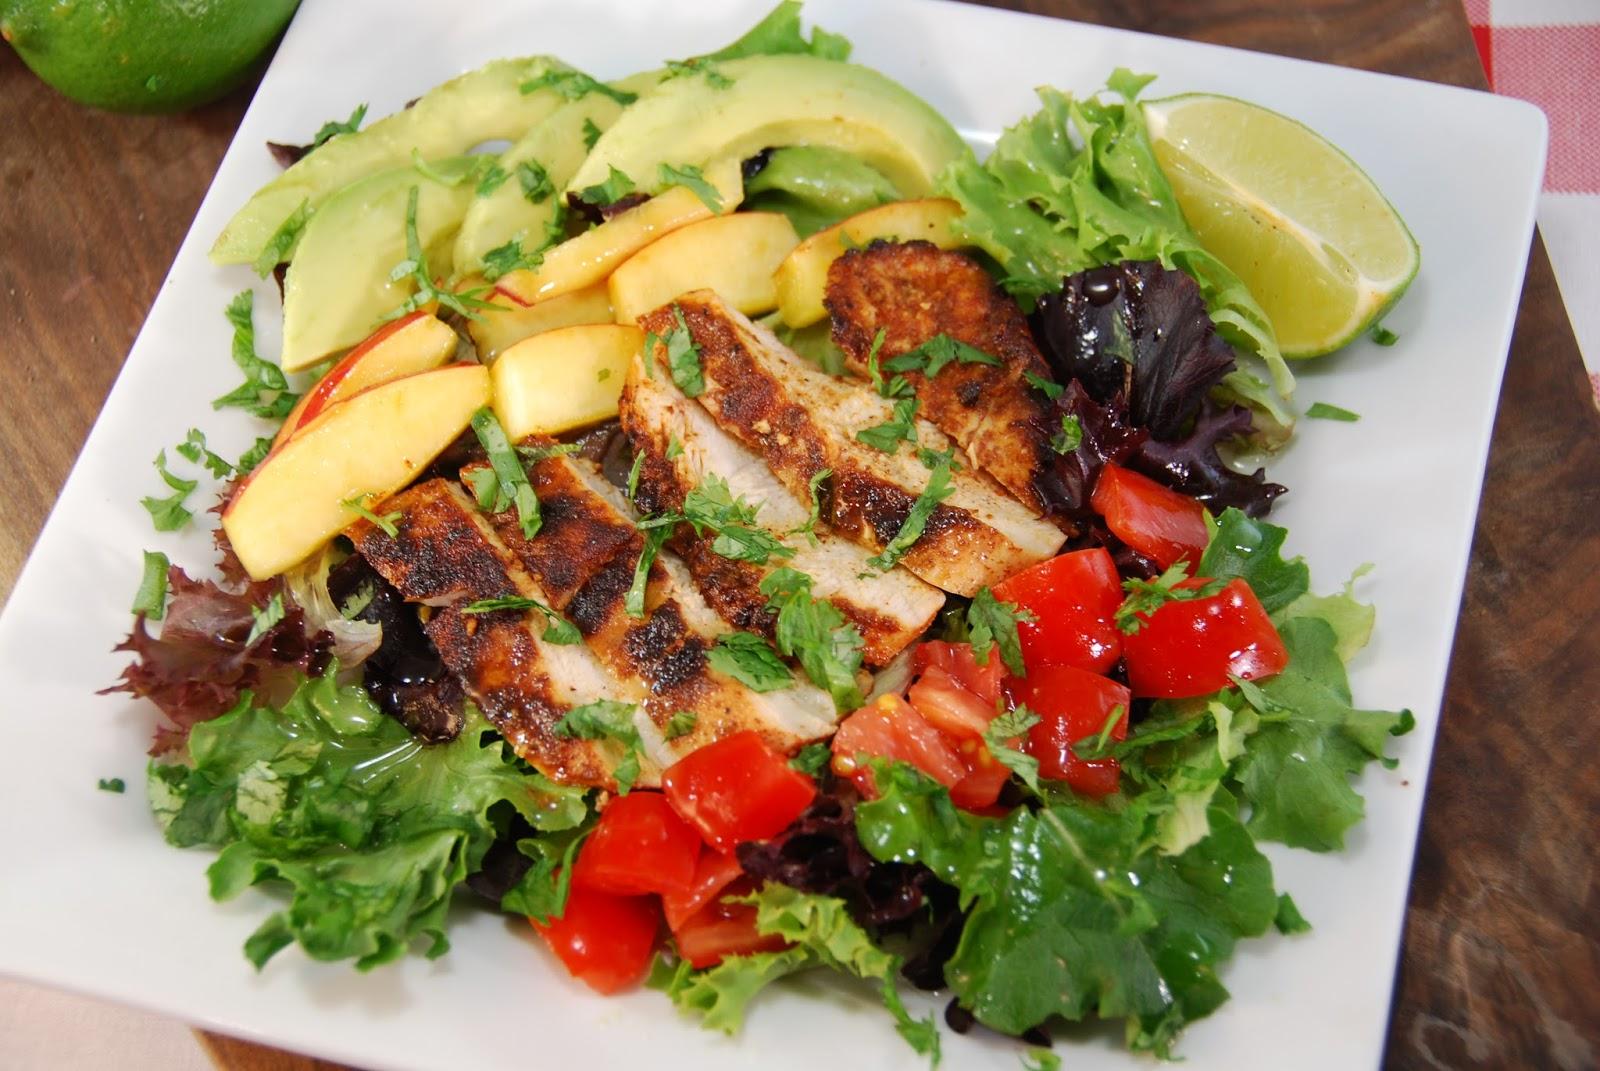 Paleo Rebel Jamaican Jerk Grilled Chicken Salad With A Lime Vinaigrette